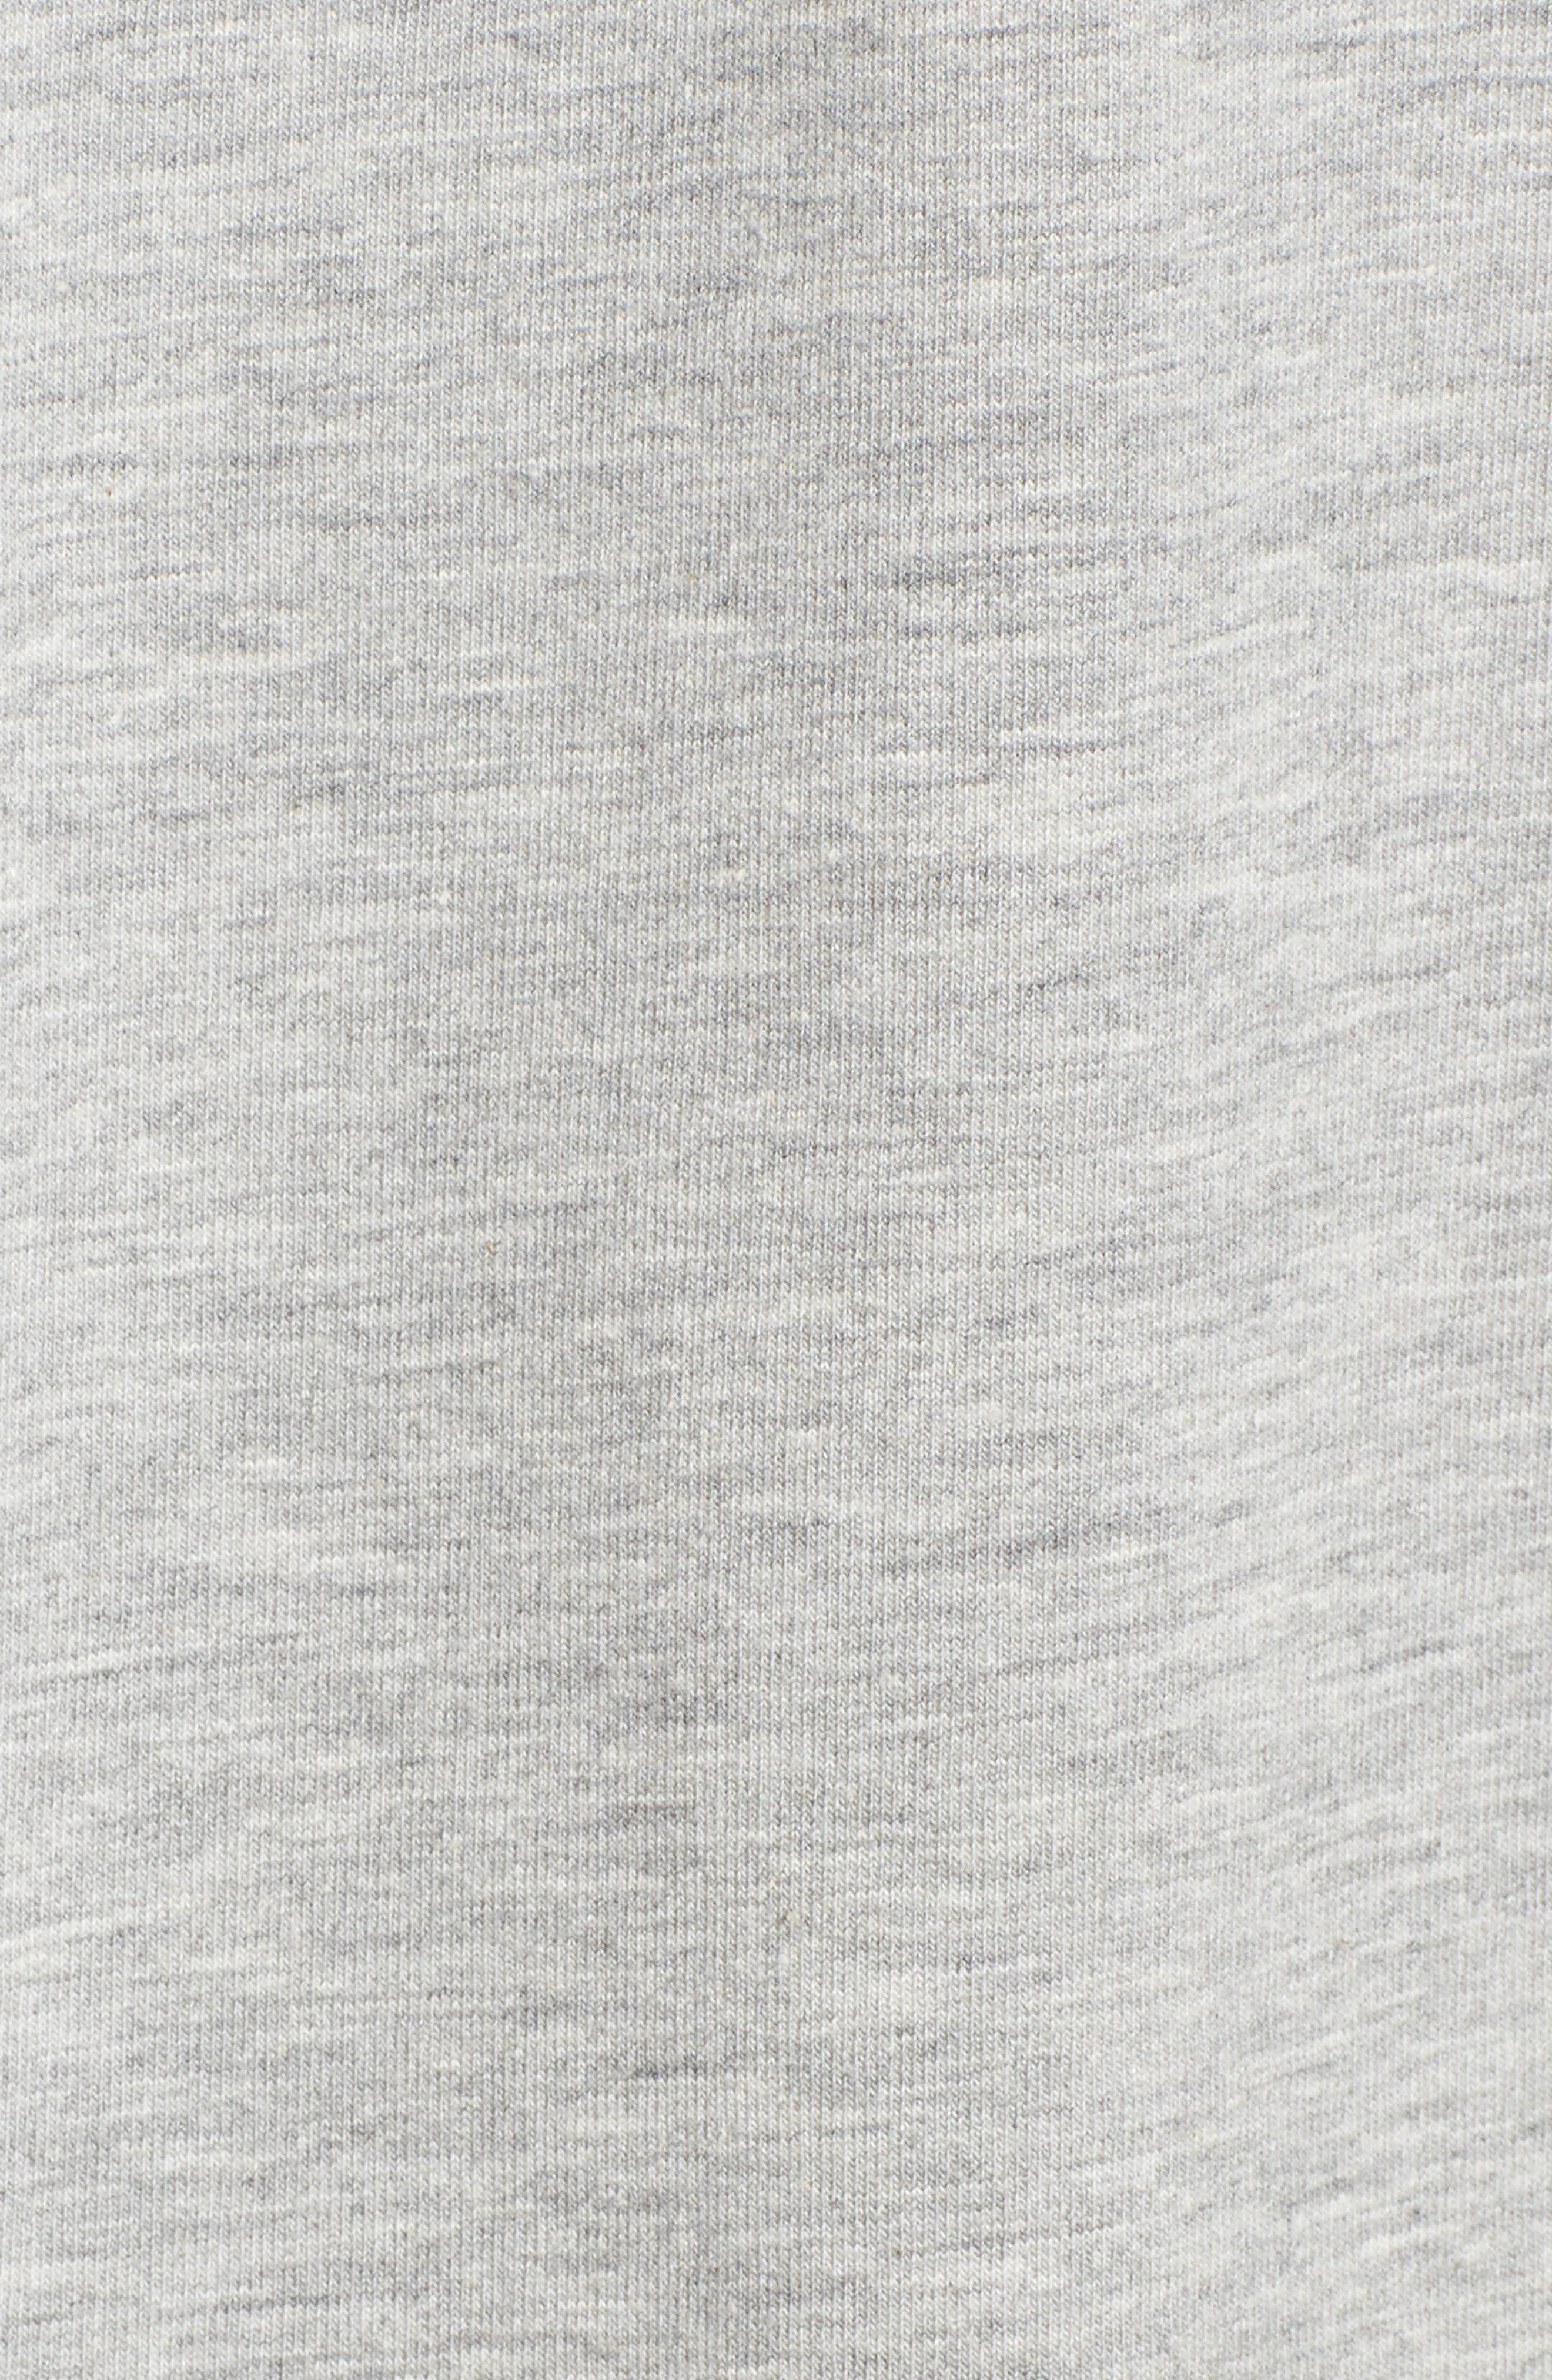 Infinity Knot Sweatshirt,                             Alternate thumbnail 5, color,                             052